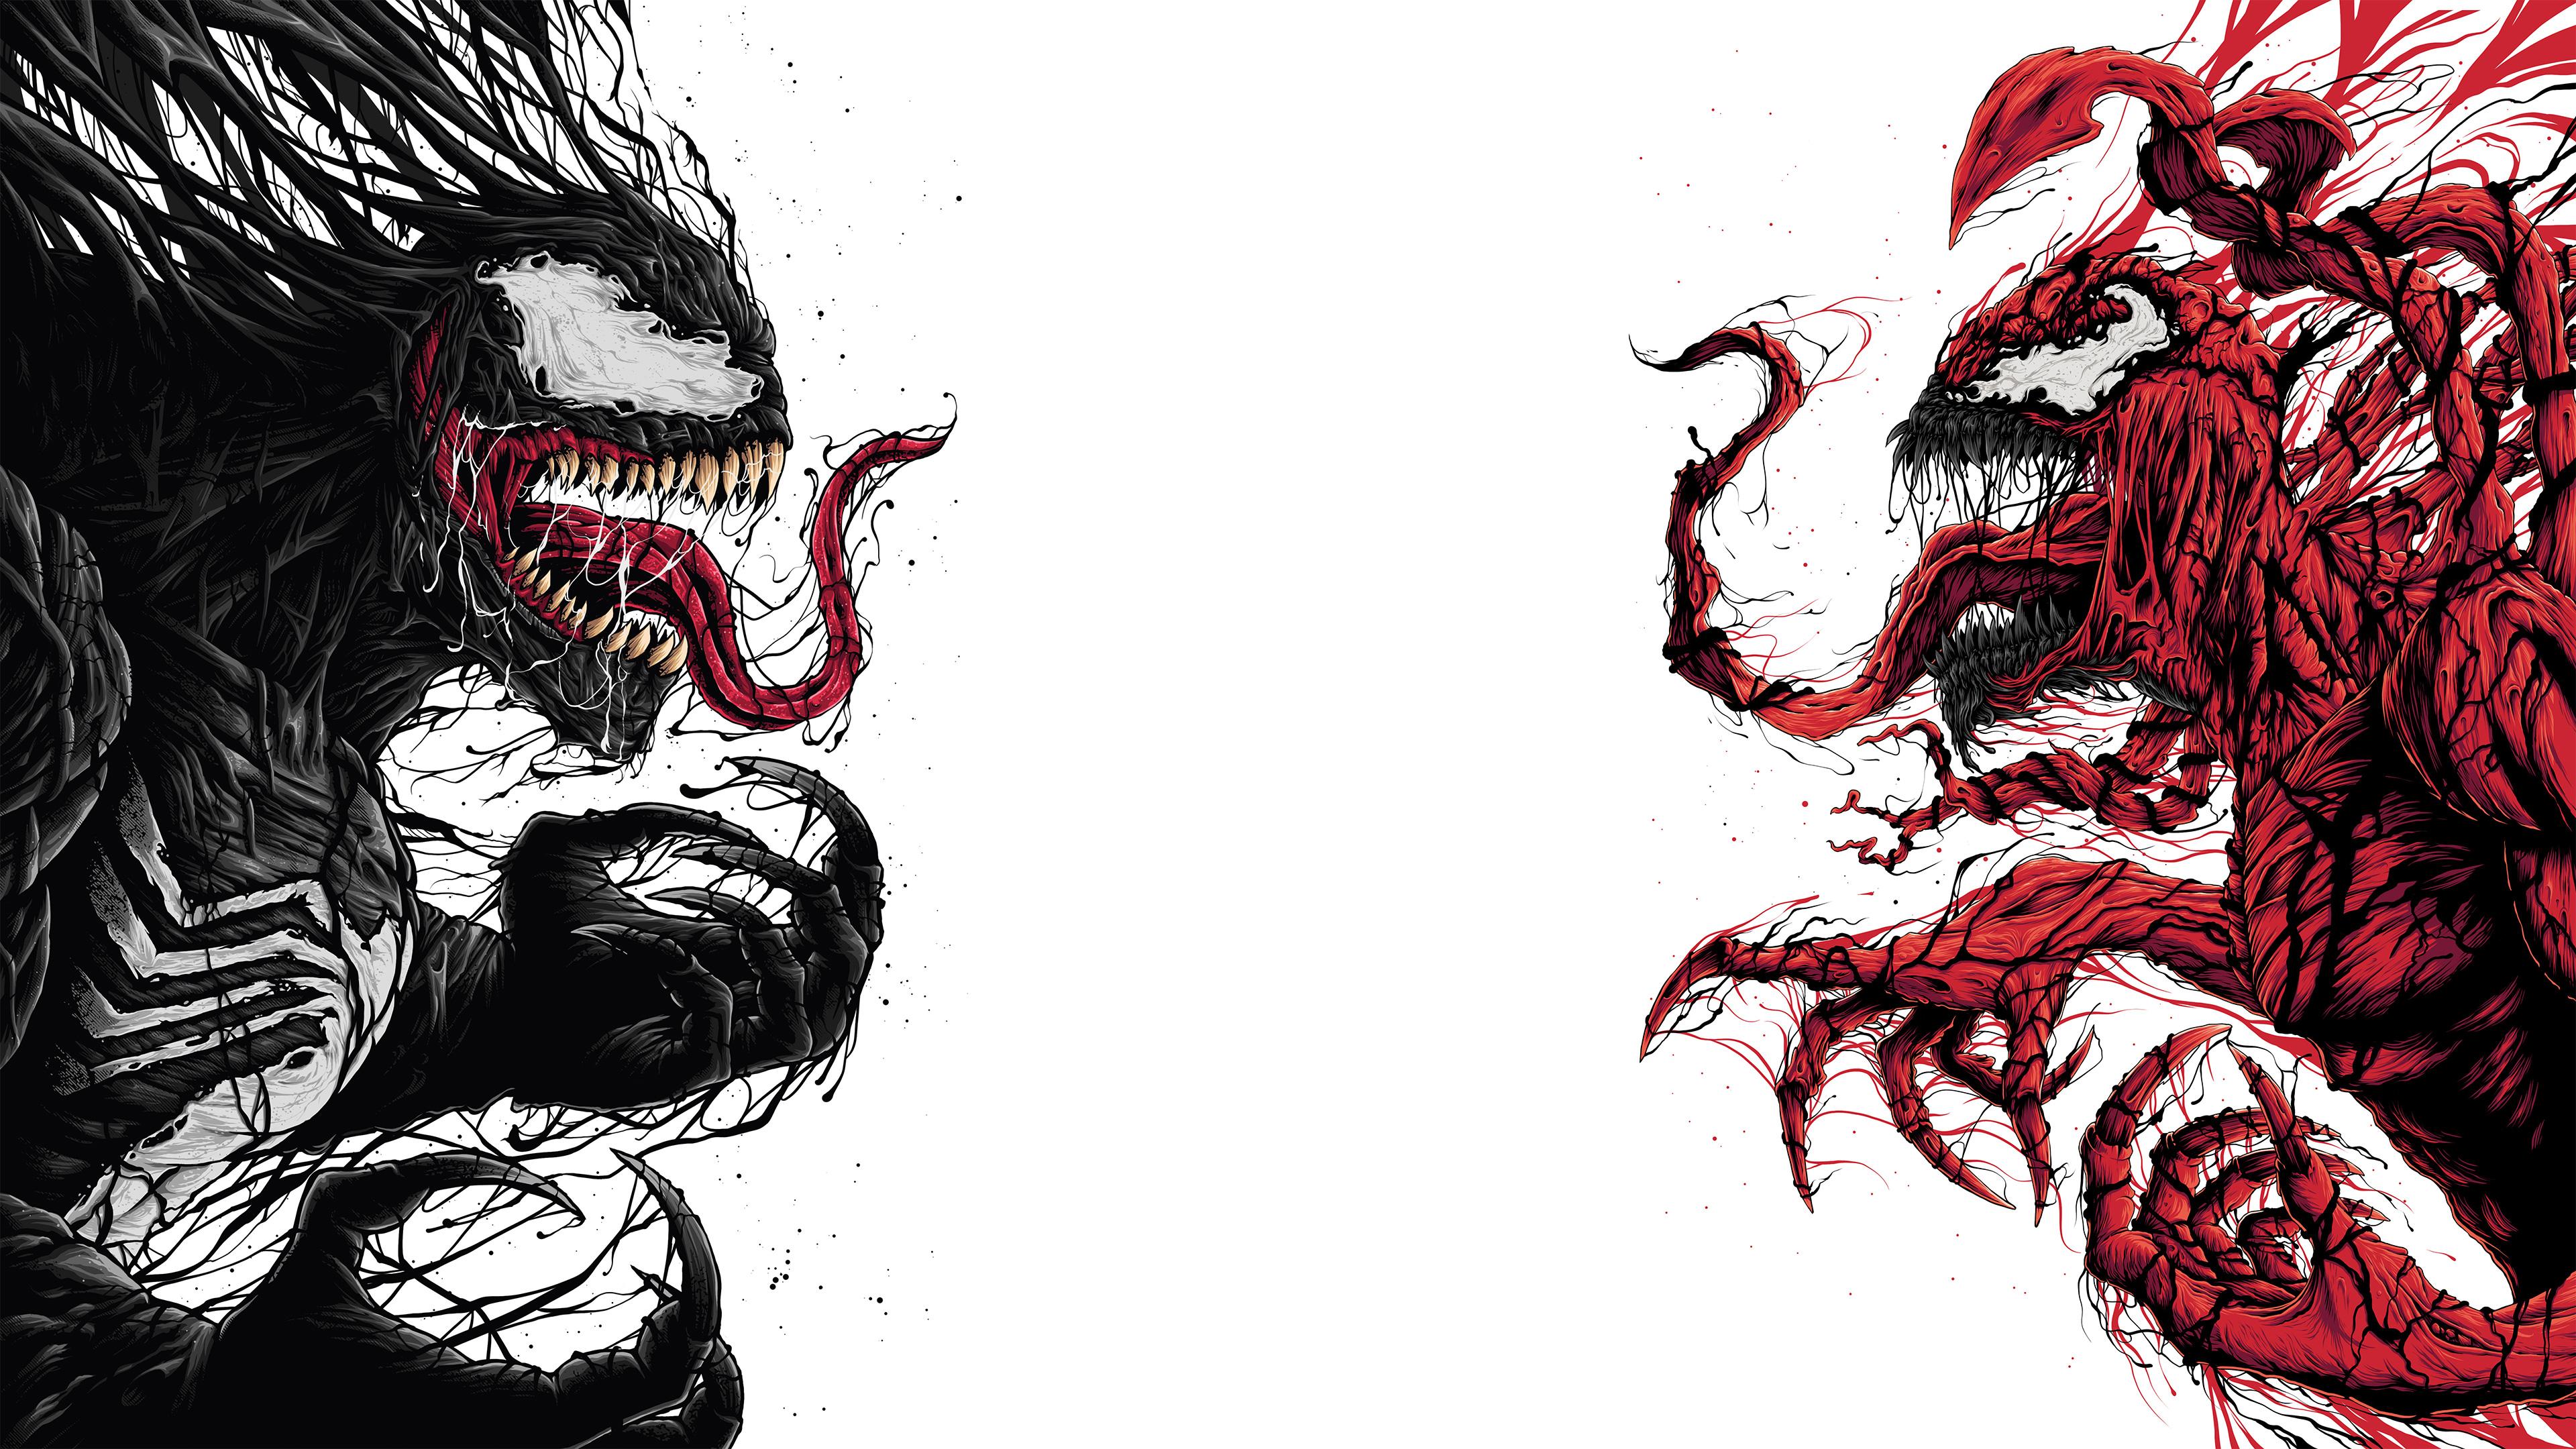 venom and carnage artwork 1538785901 - Venom And Carnage Artwork - Venom wallpapers, supervillain wallpapers, superheroes wallpapers, hd-wallpapers, digital art wallpapers, carnage wallpapers, behance wallpapers, artwork wallpapers, 4k-wallpapers